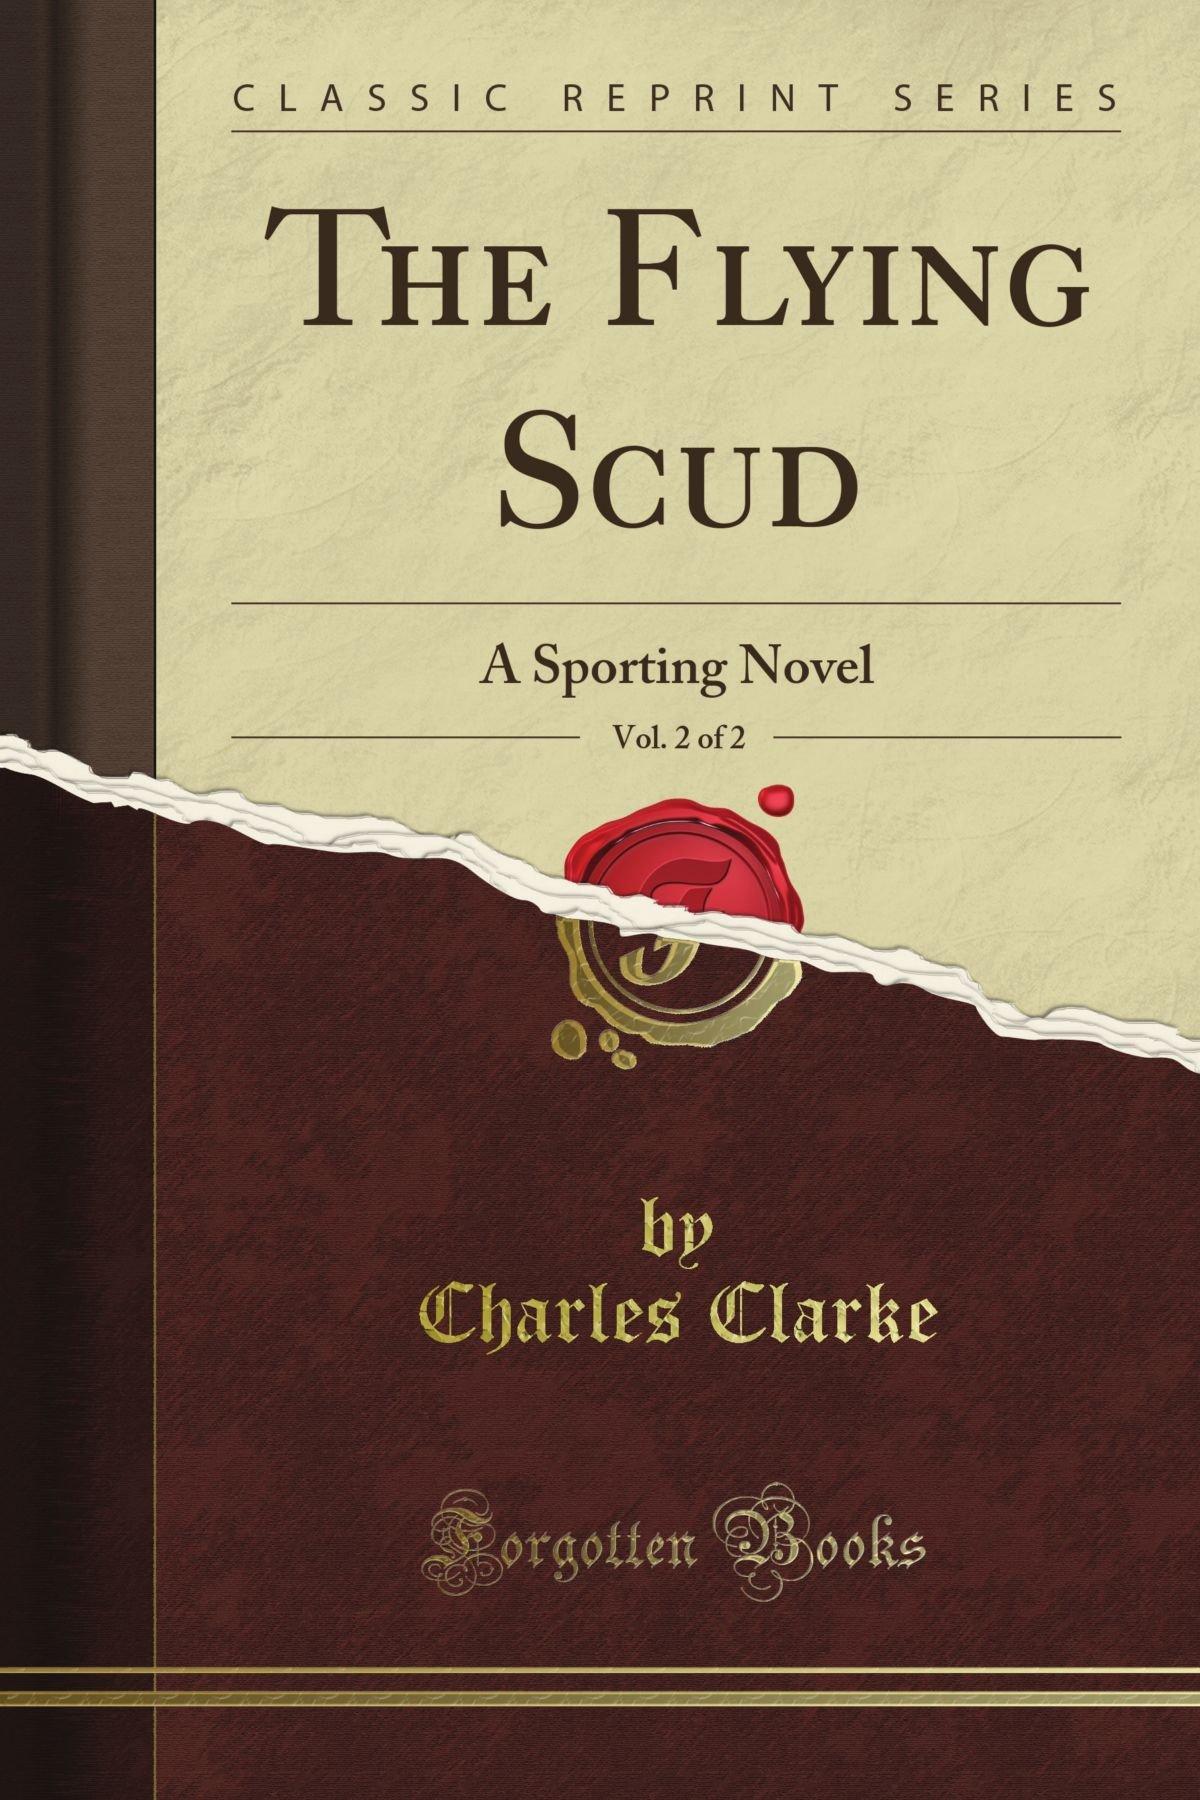 The Flying Scud: A Sporting Novel, Vol. 2 of 2 (Classic Reprint) PDF